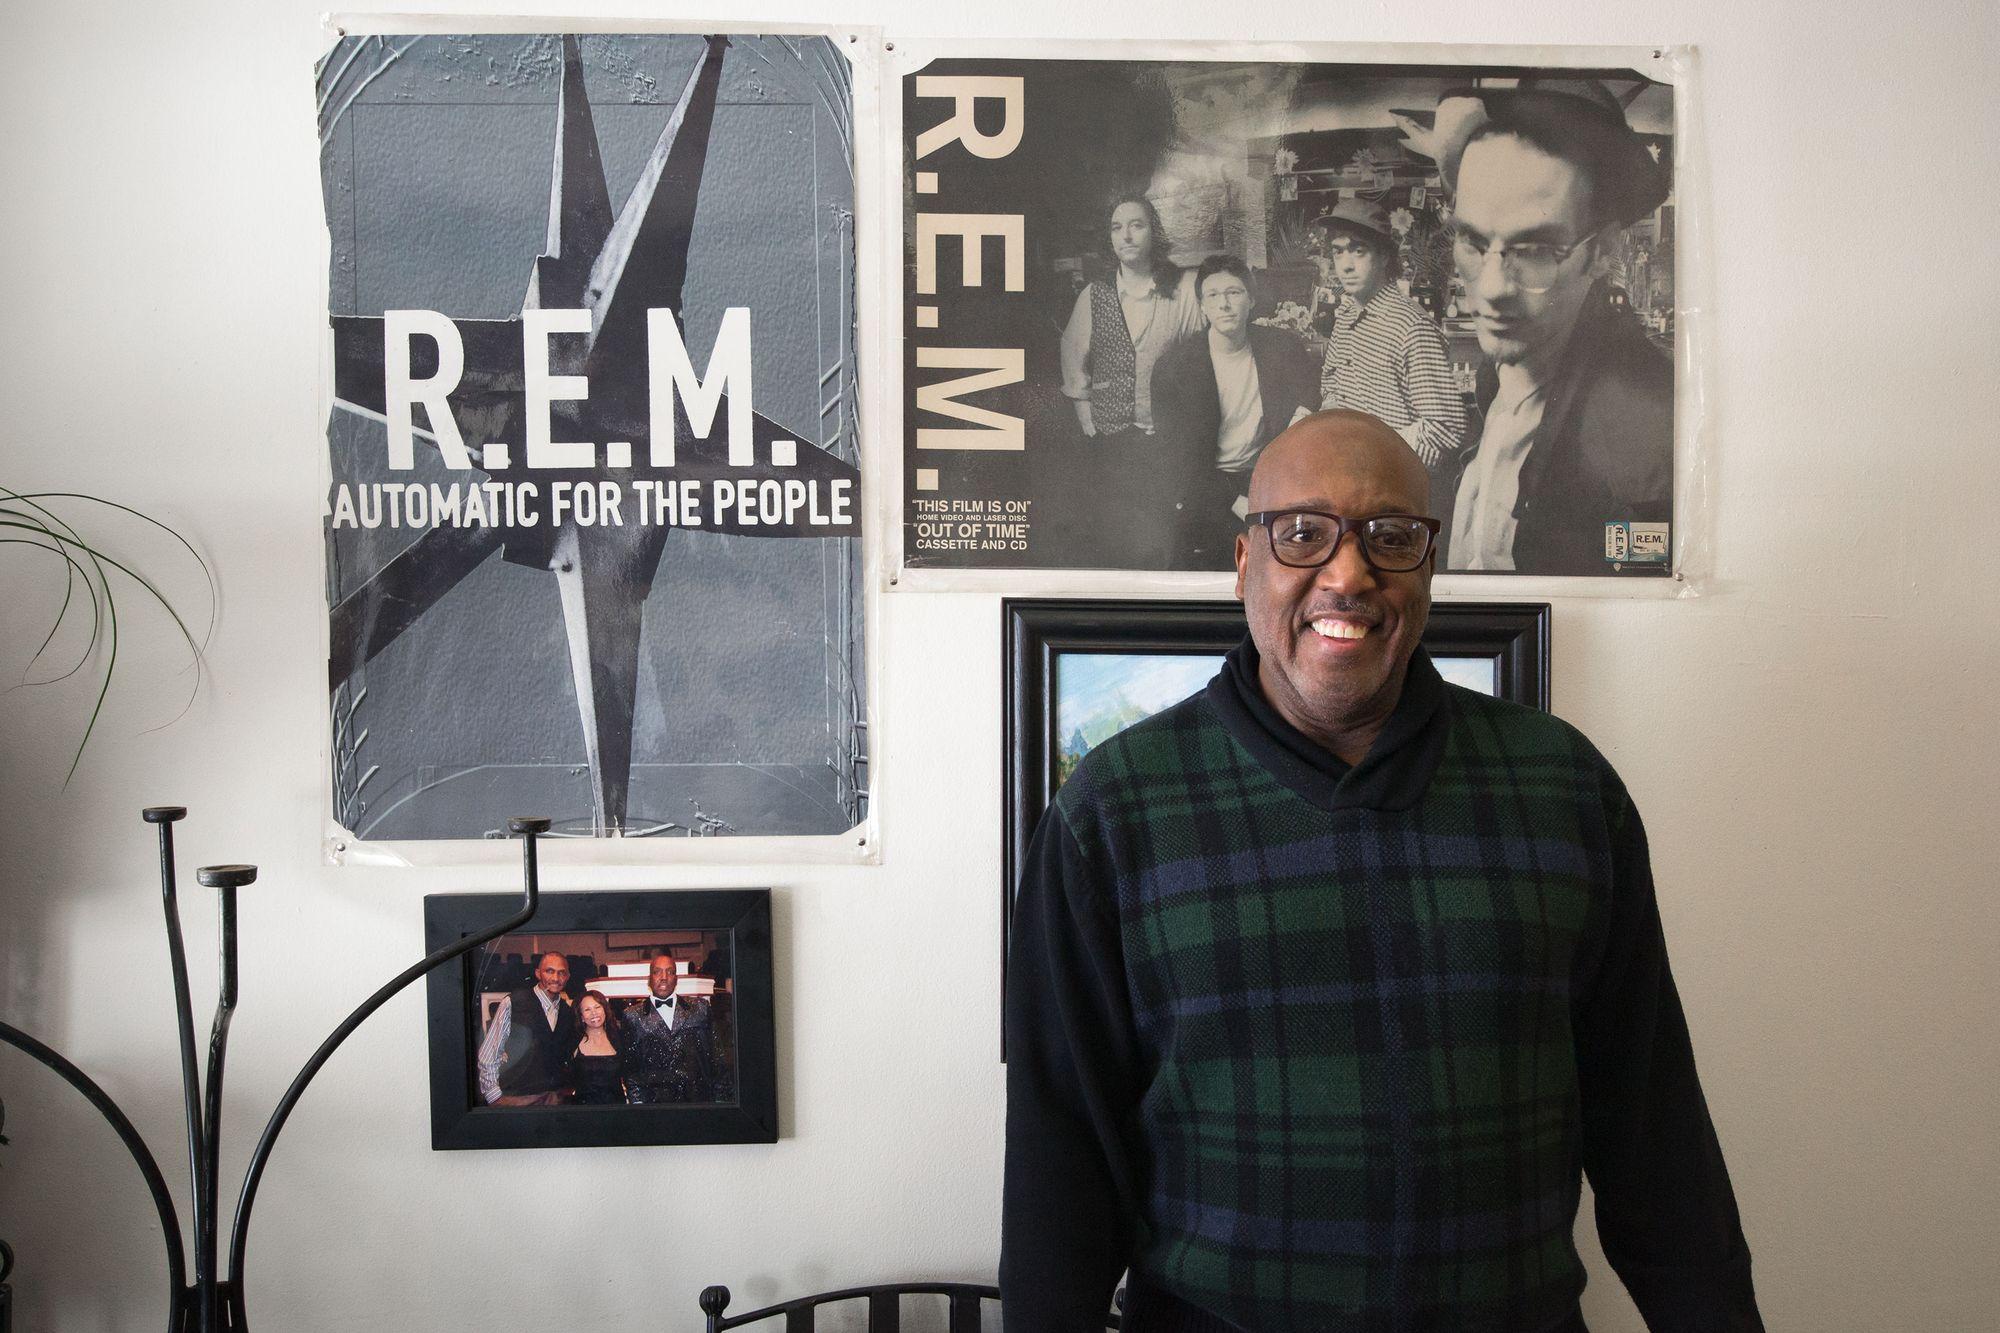 Dexter Weaver in front of the R.E.M. album cover.